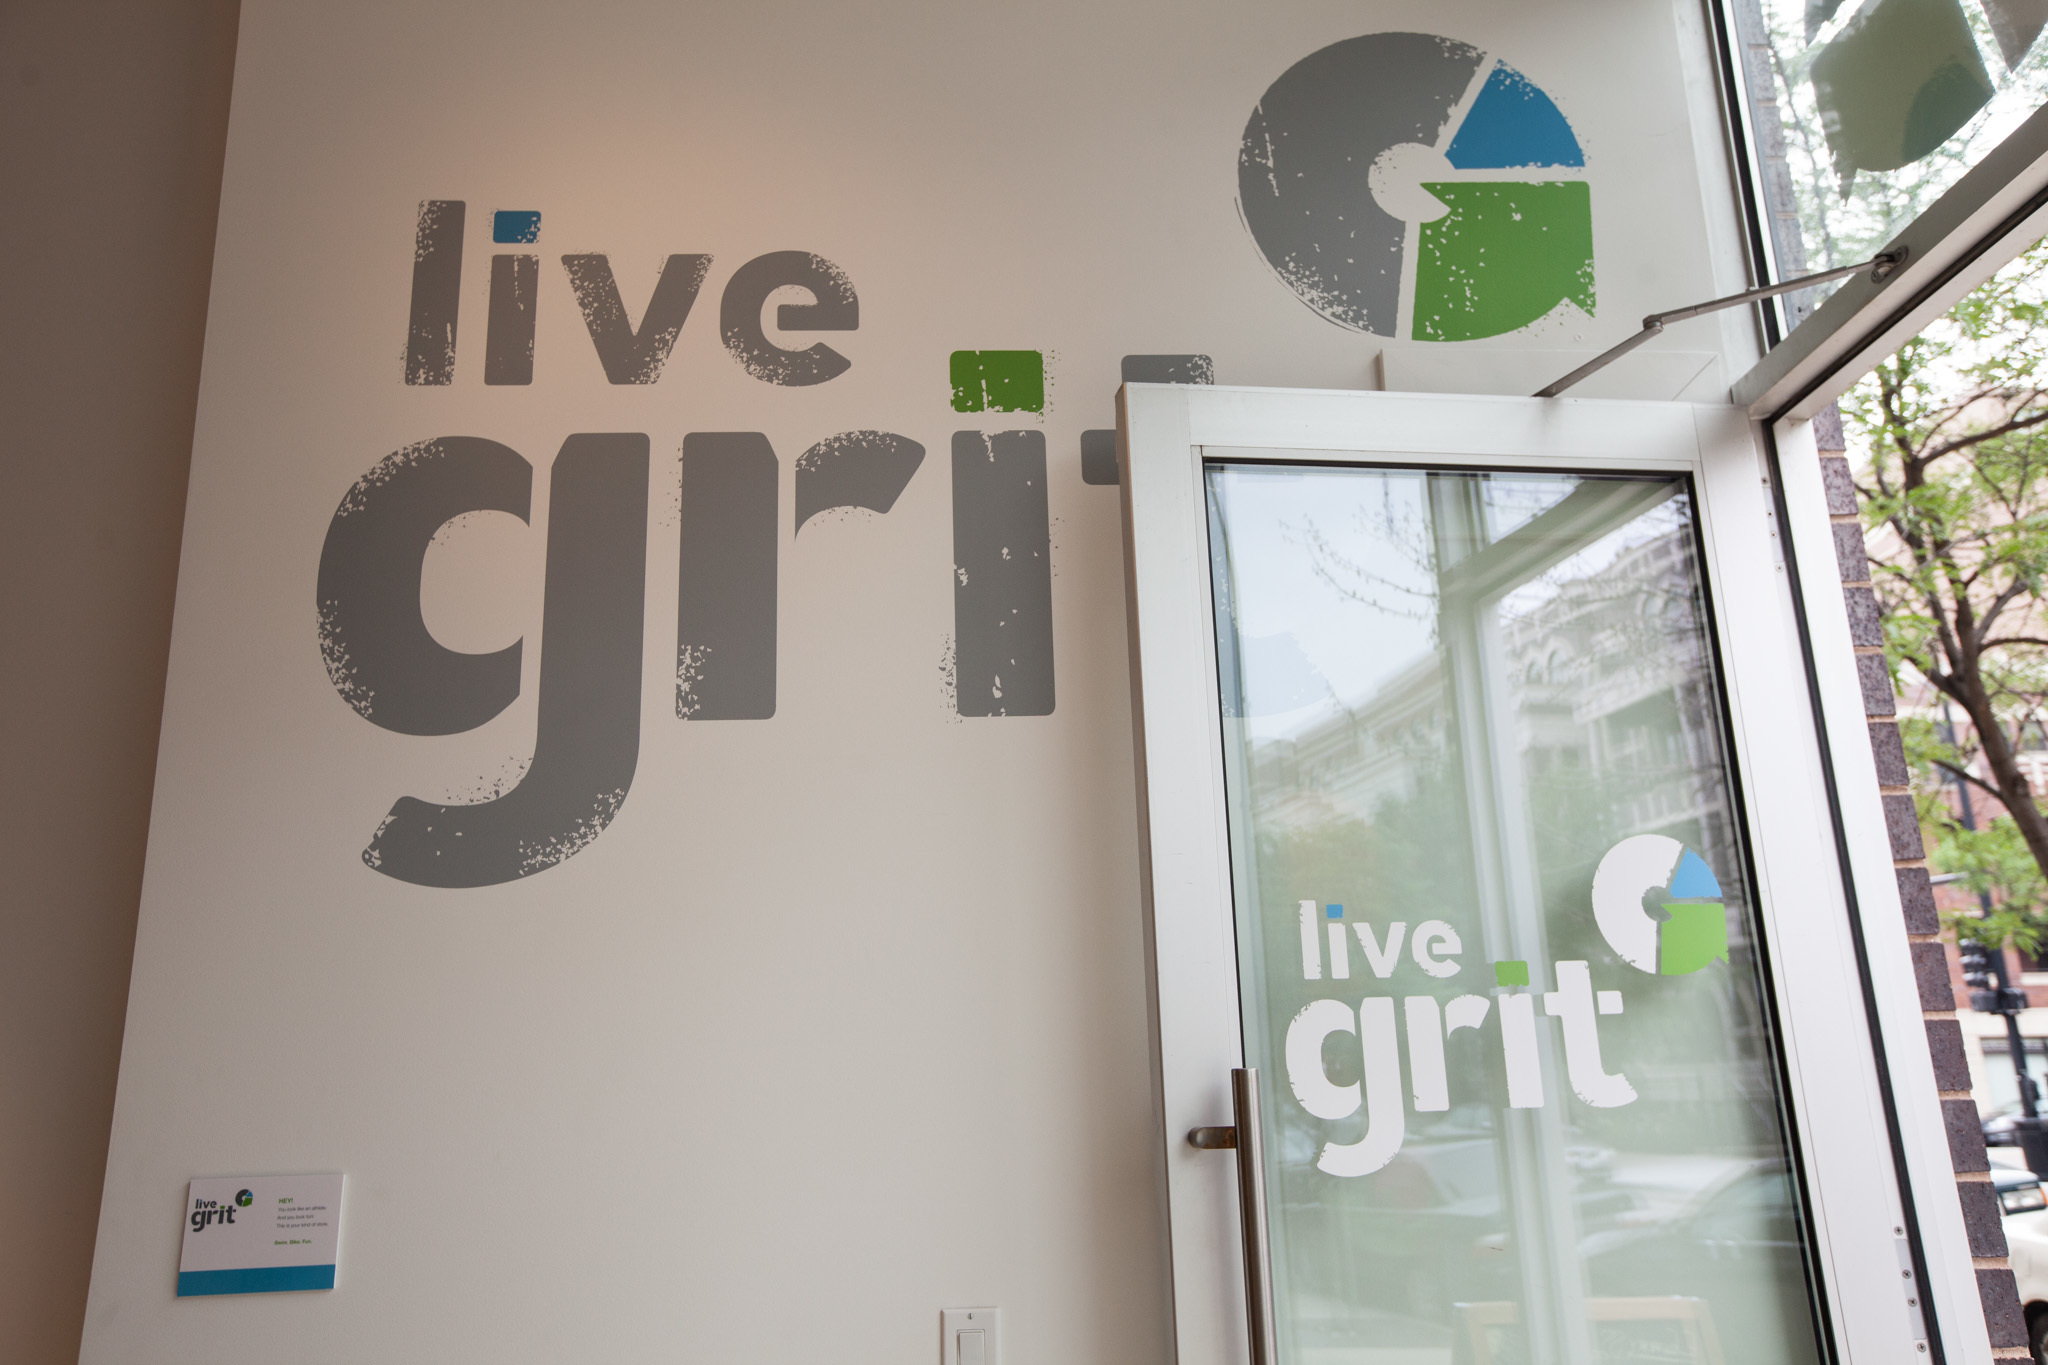 Live Grit